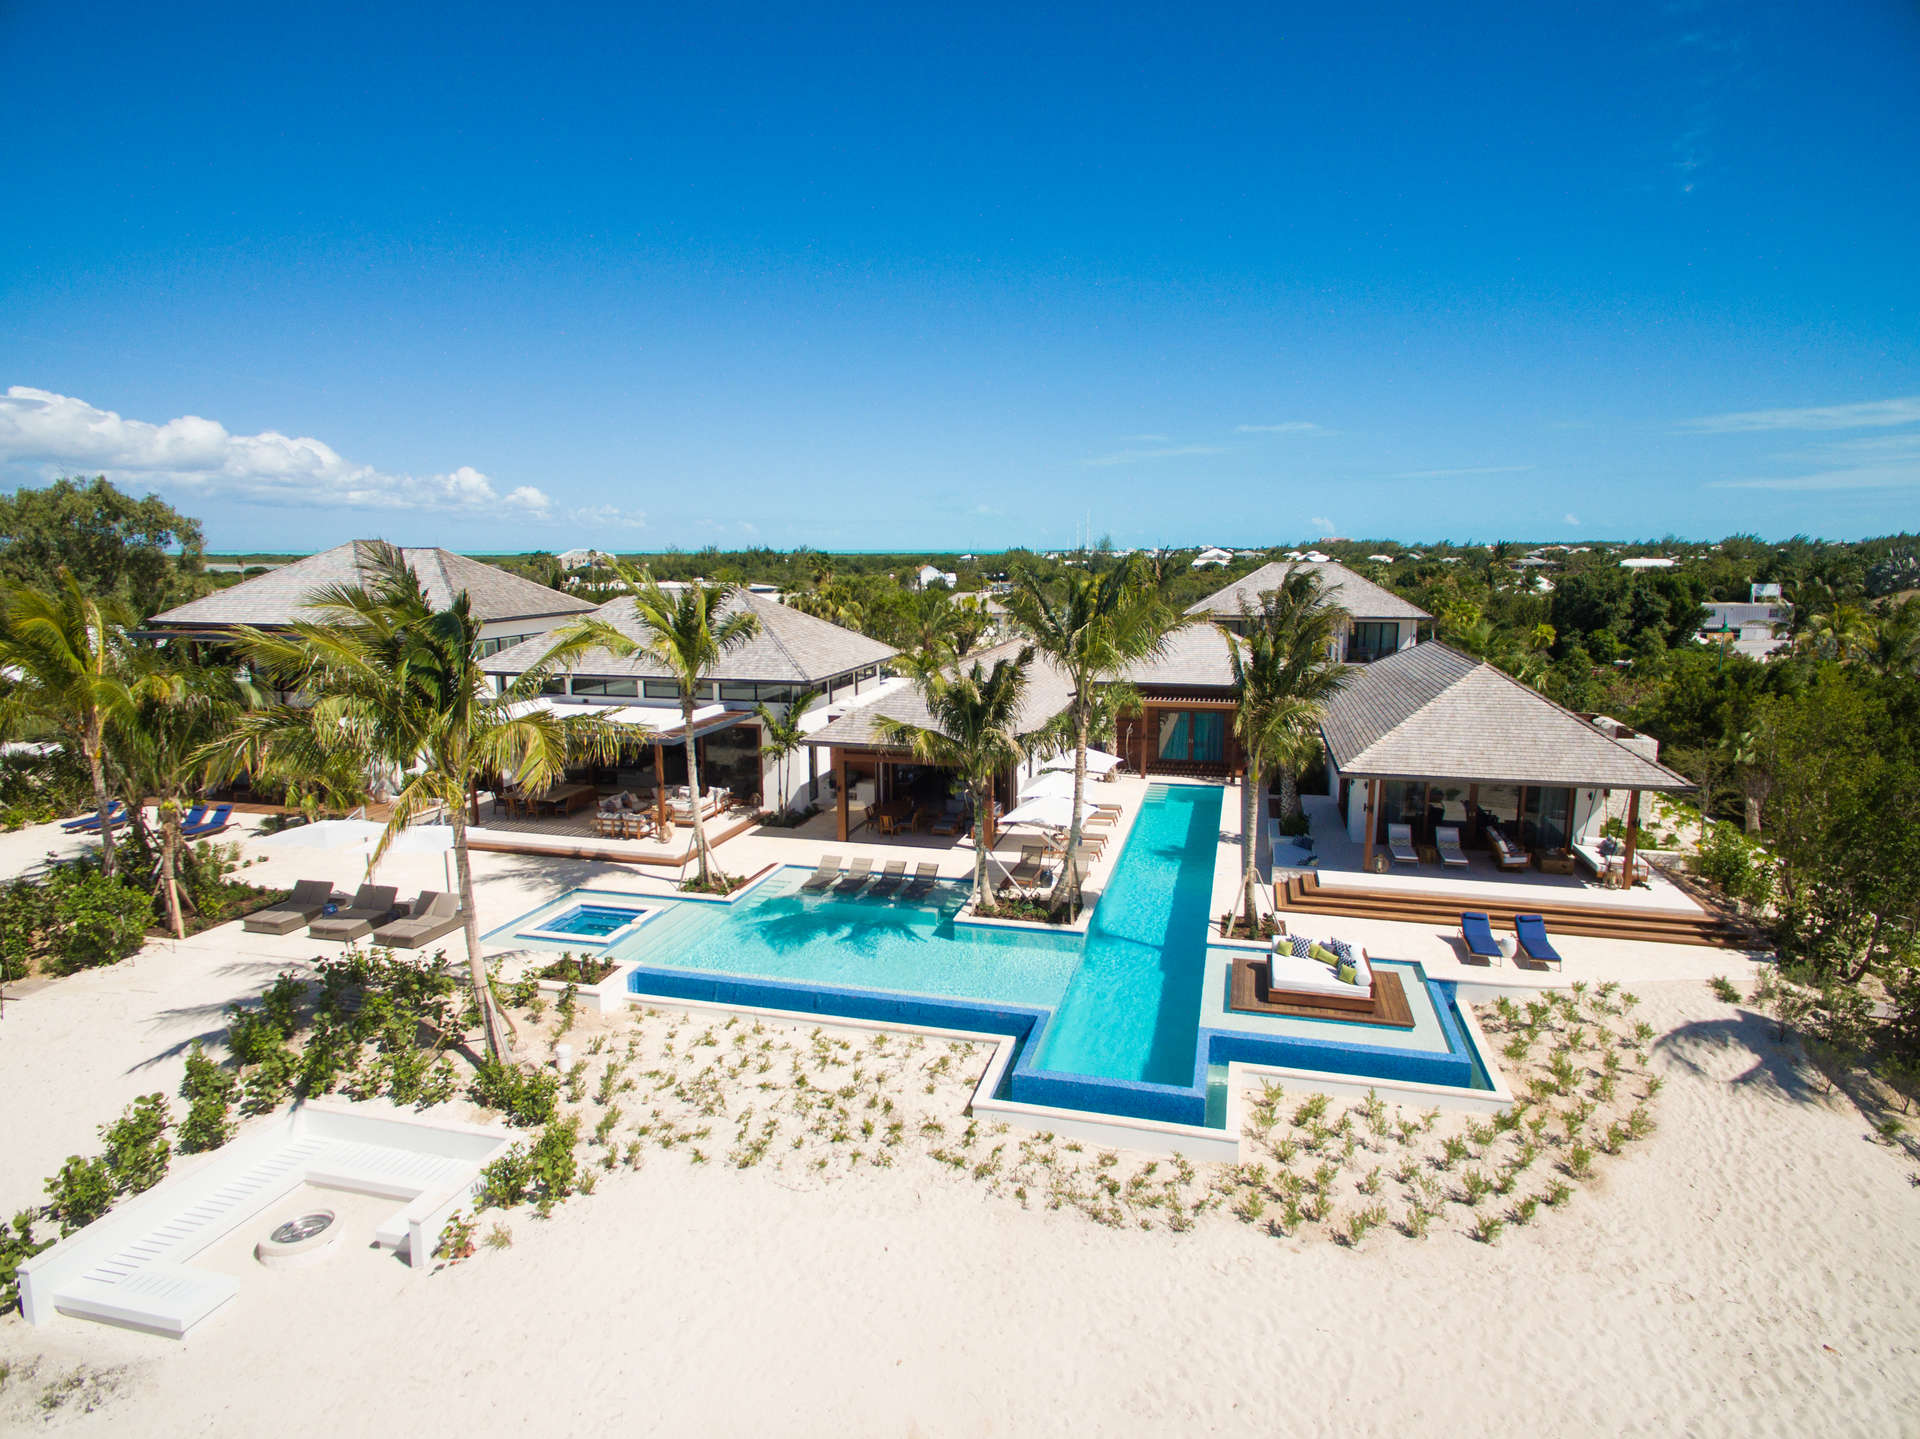 Luxury villa rentals caribbean - Turks and caicos - Providenciales - Grace bay - Hawksbill - Image 1/30